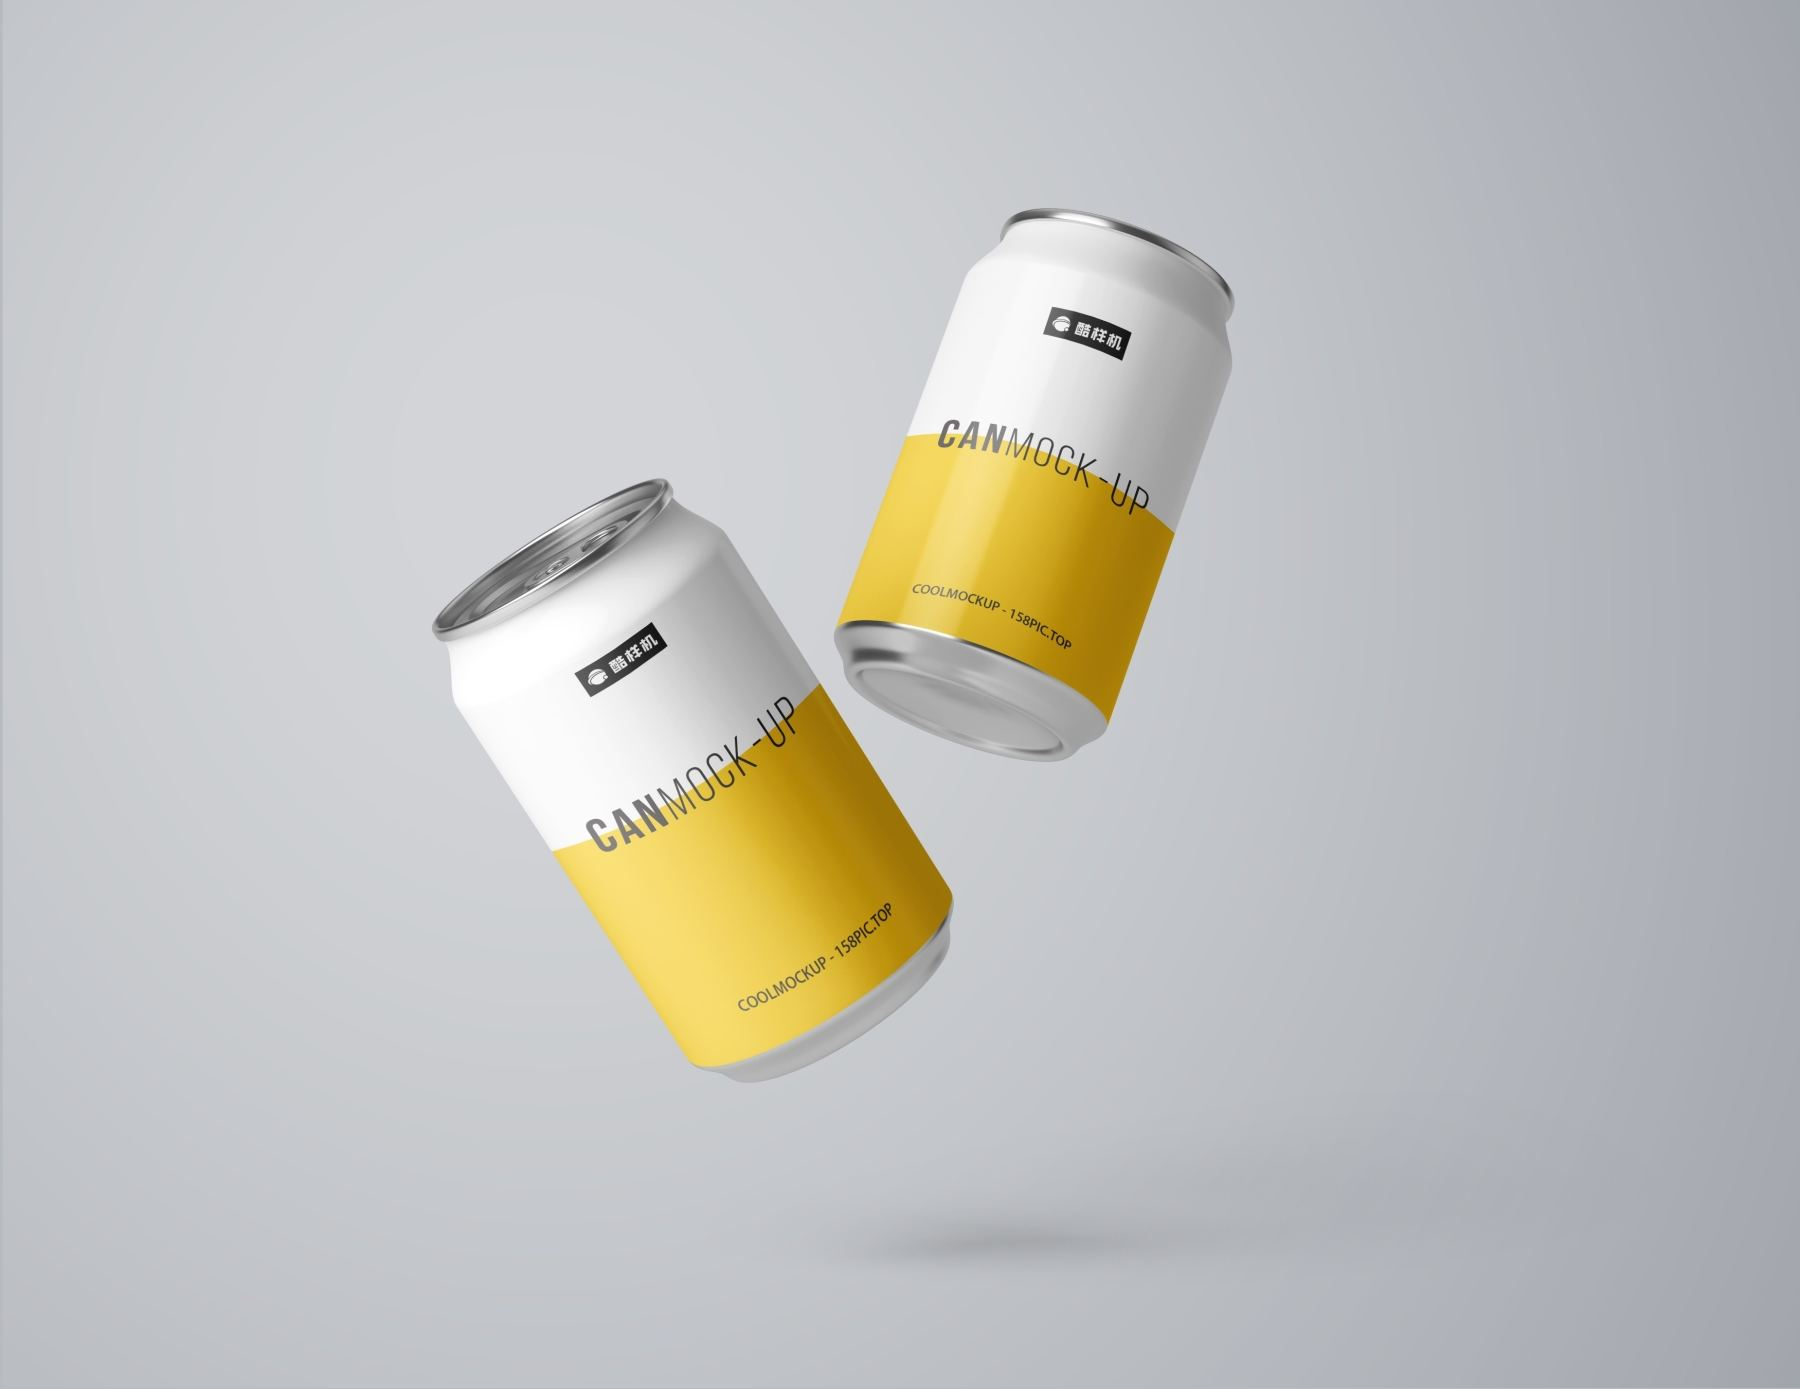 7149e4cde510296 - 简约饮料啤酒包装易拉罐样机